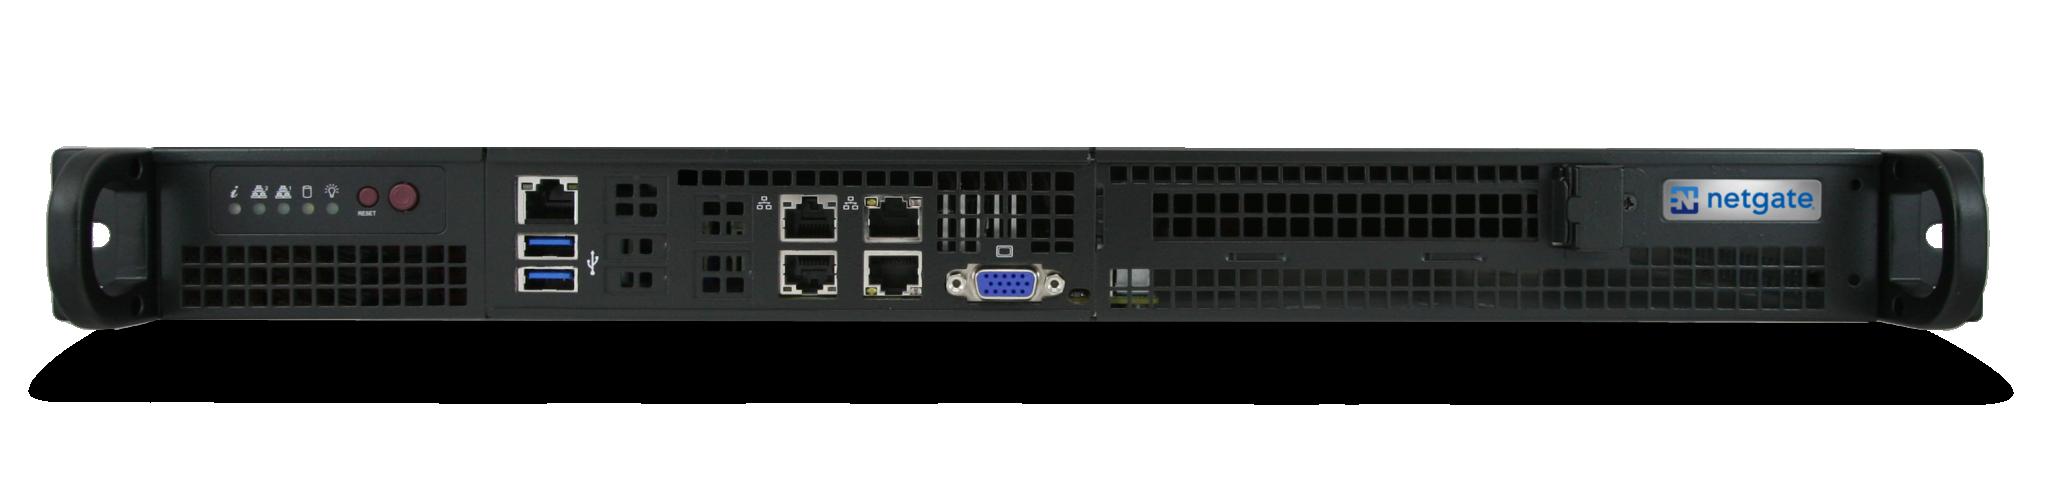 HIGH AVAILABILITY XG-1541 1U pfSense® Security Gateway Appliance